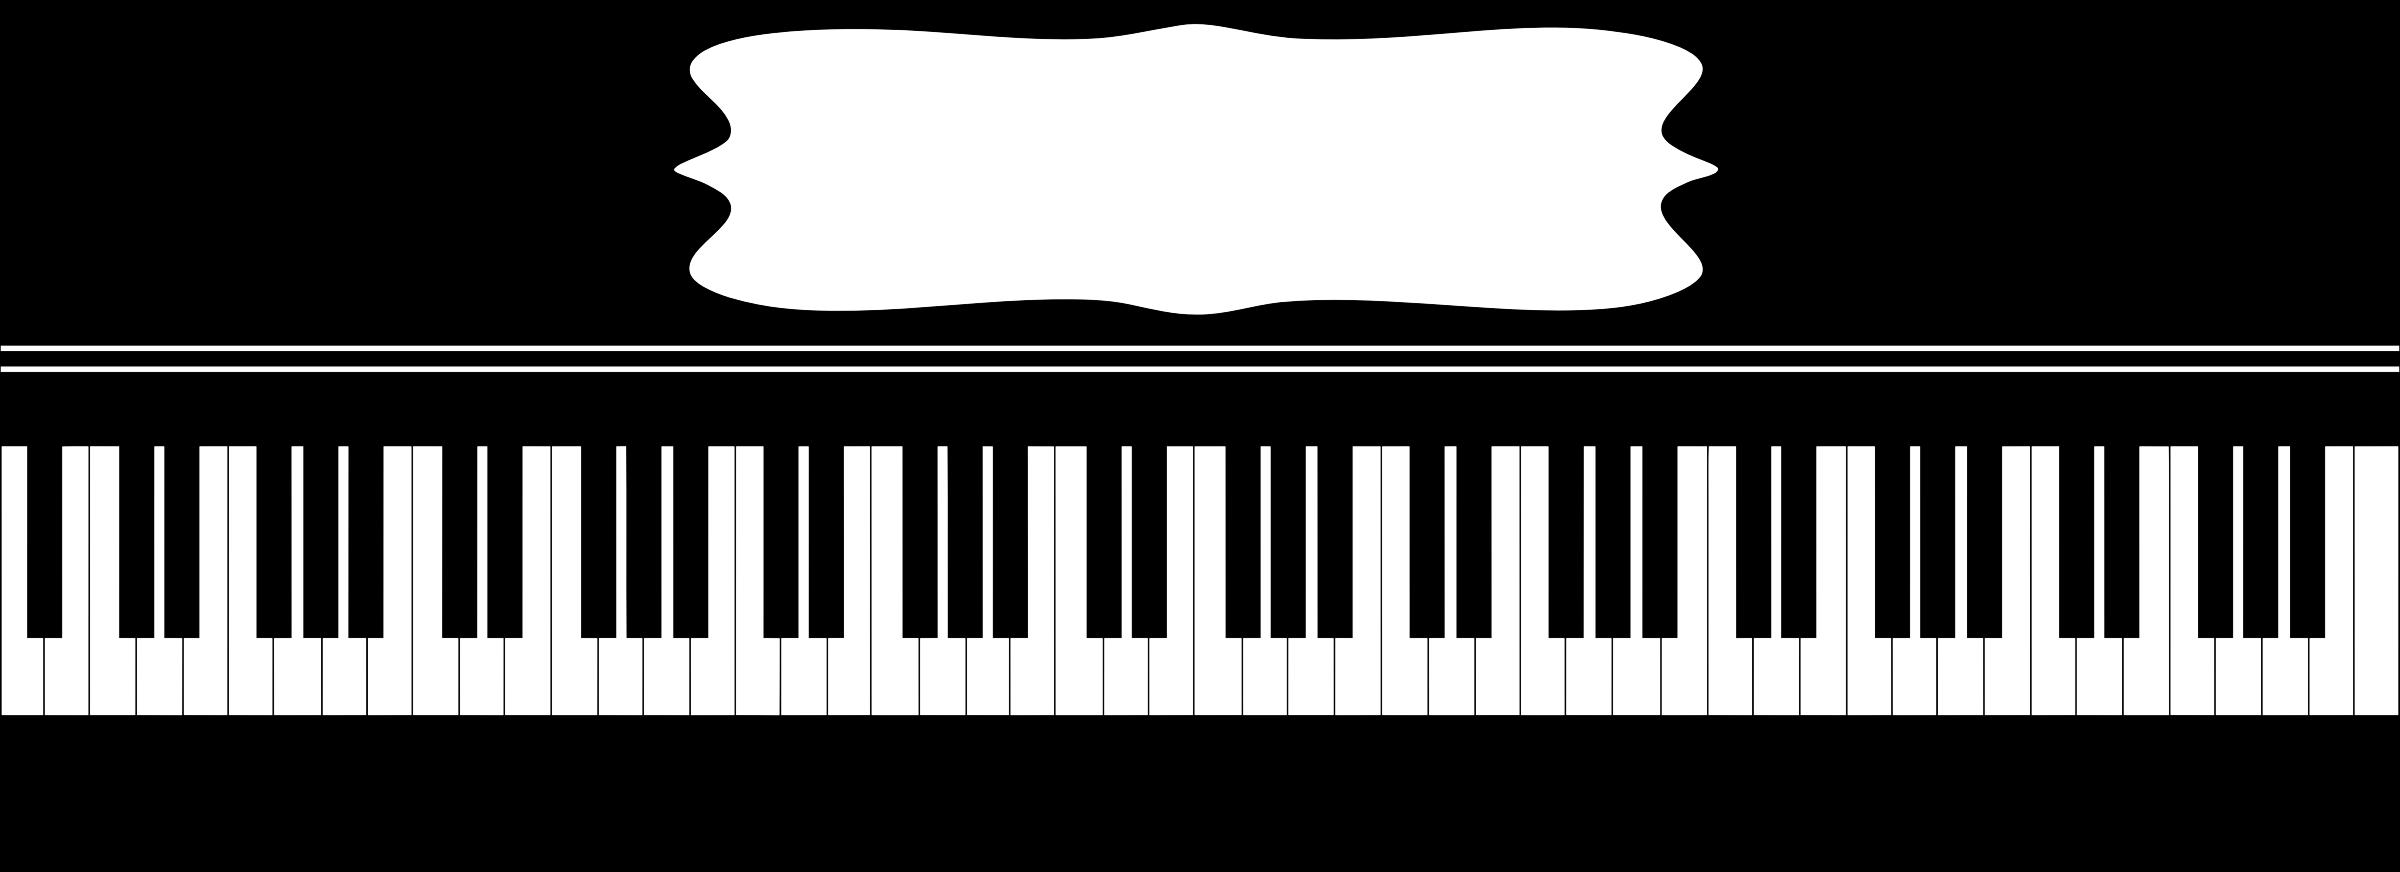 картинка клавиатура фортепиано на прозрачном фоне карьер уже был